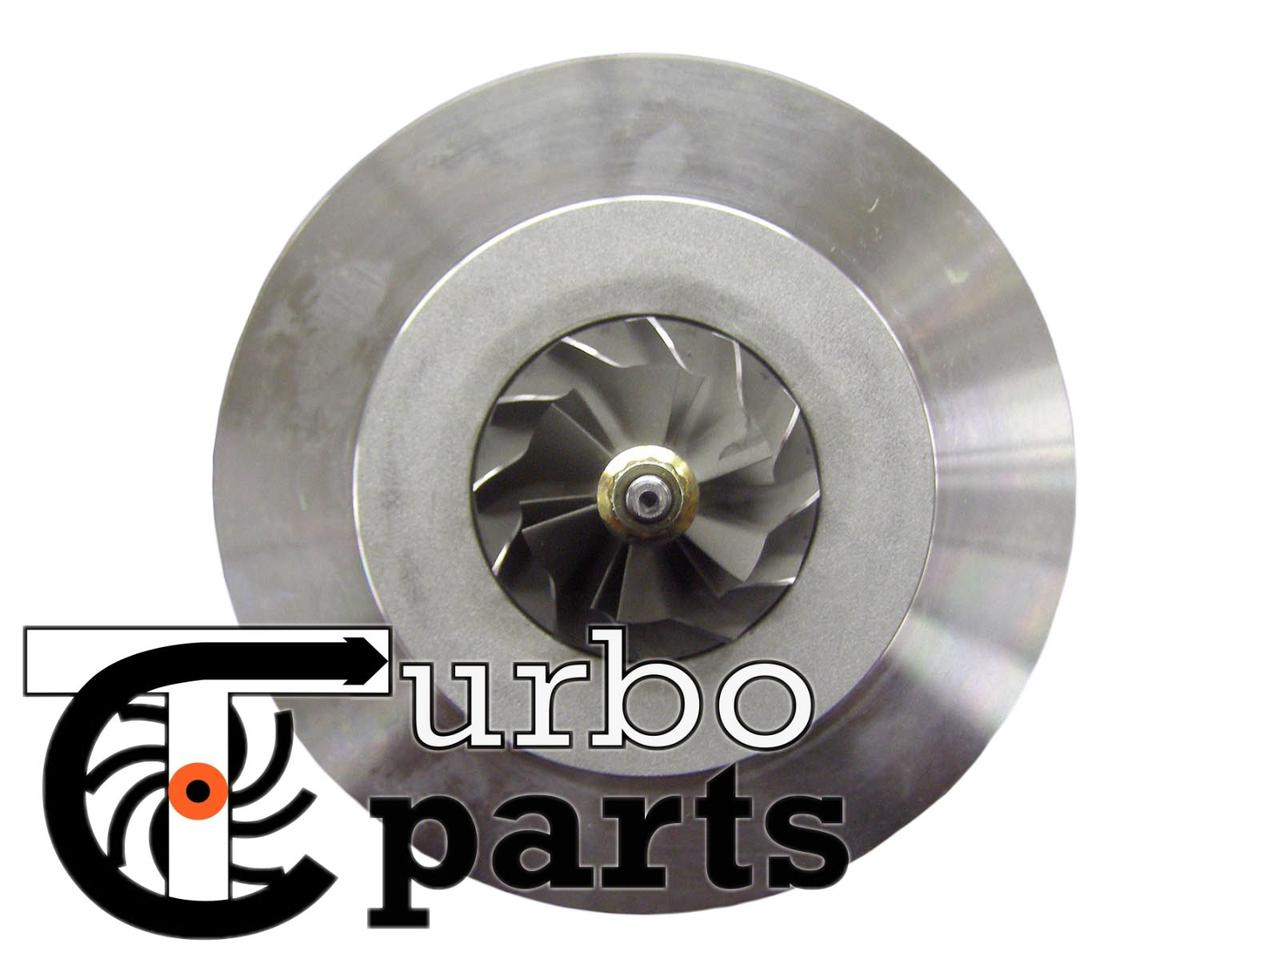 Картридж турбіни Citreon 1.6 HDIBerlingo/ C2/ C3/ C4/ C5/ Picasso/ Xsara від 2003 р. в. 753420, 740821, 762328